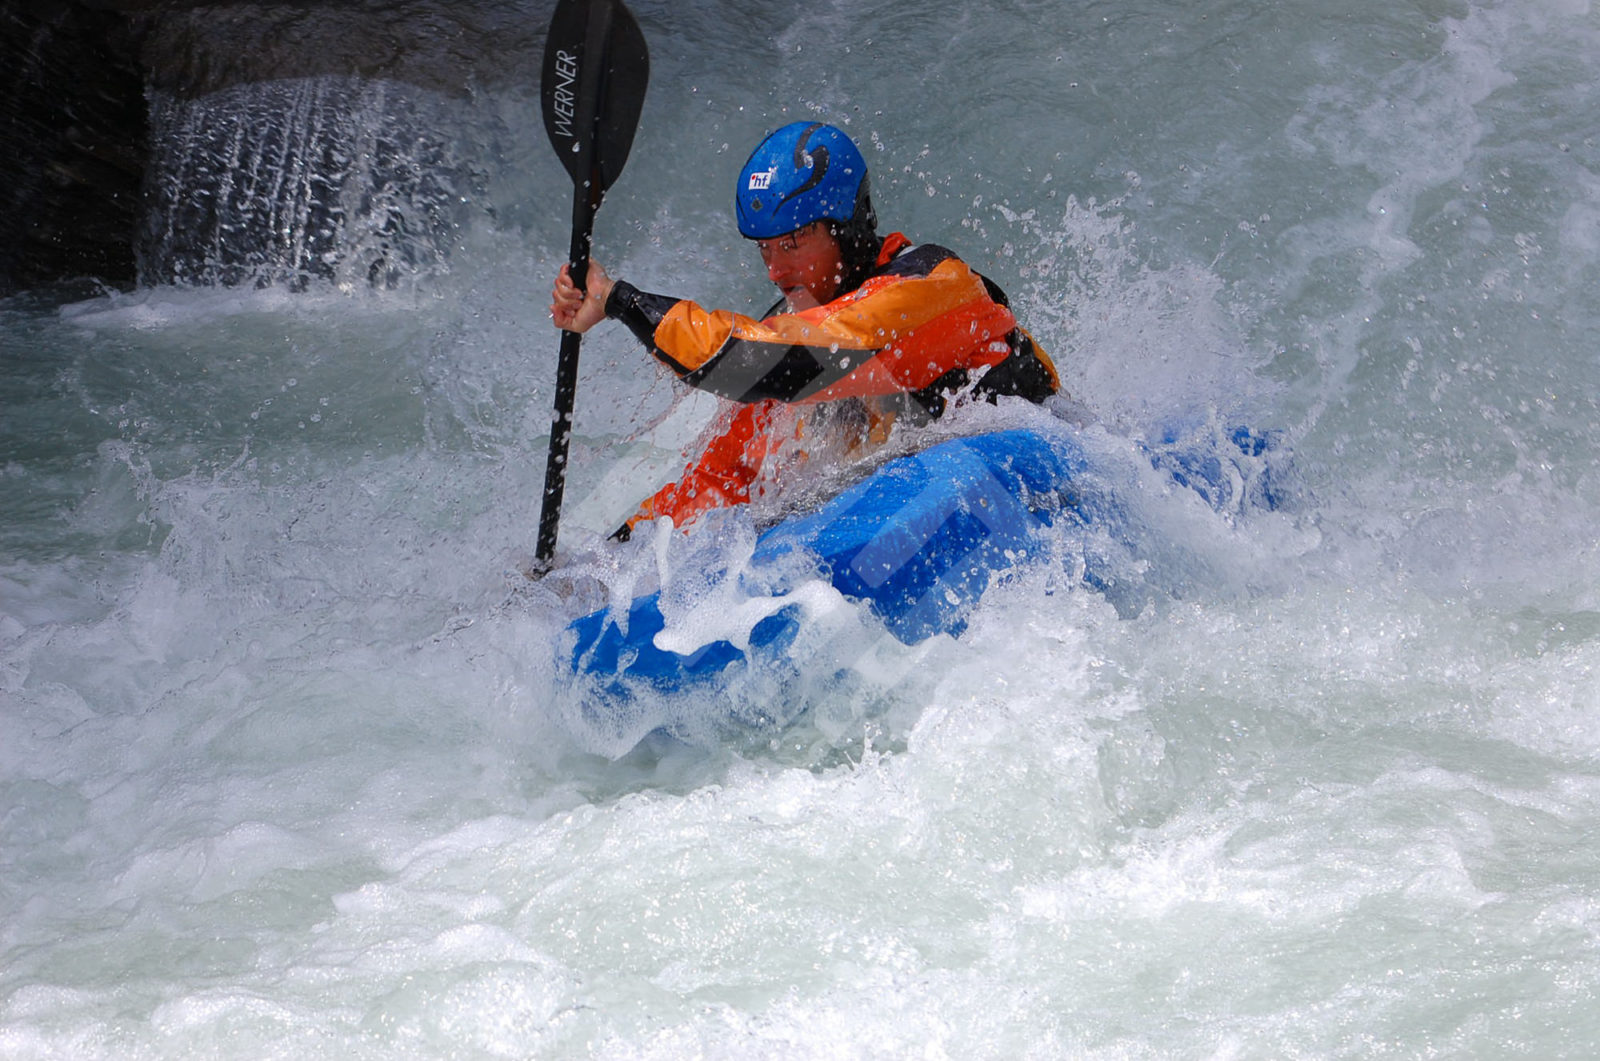 kanuschule_wildwasser-kajak-reise-engadin_holger-heuber-abenteuer-4